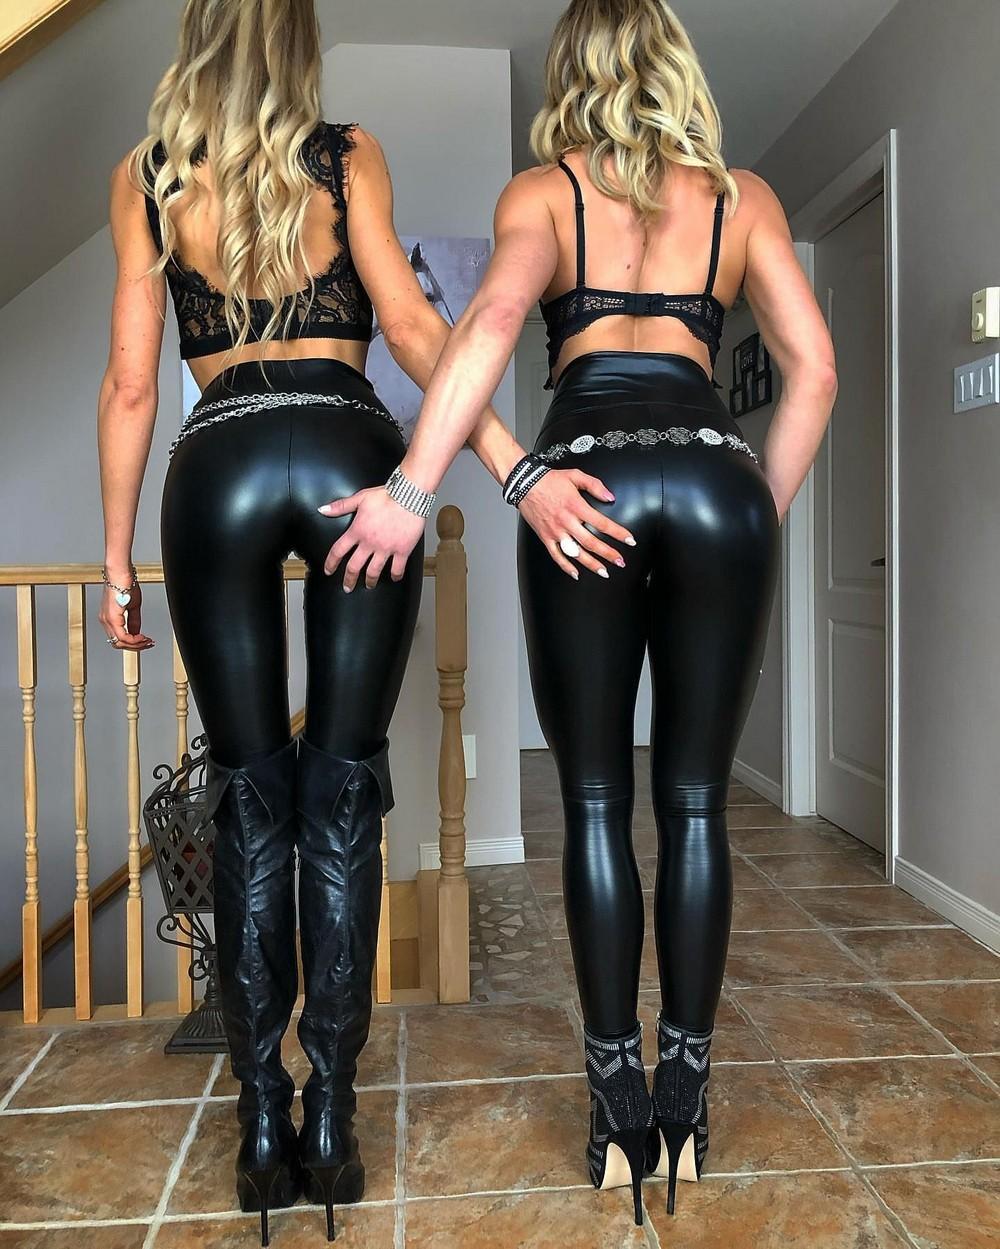 Девушки в нарядах из латекса